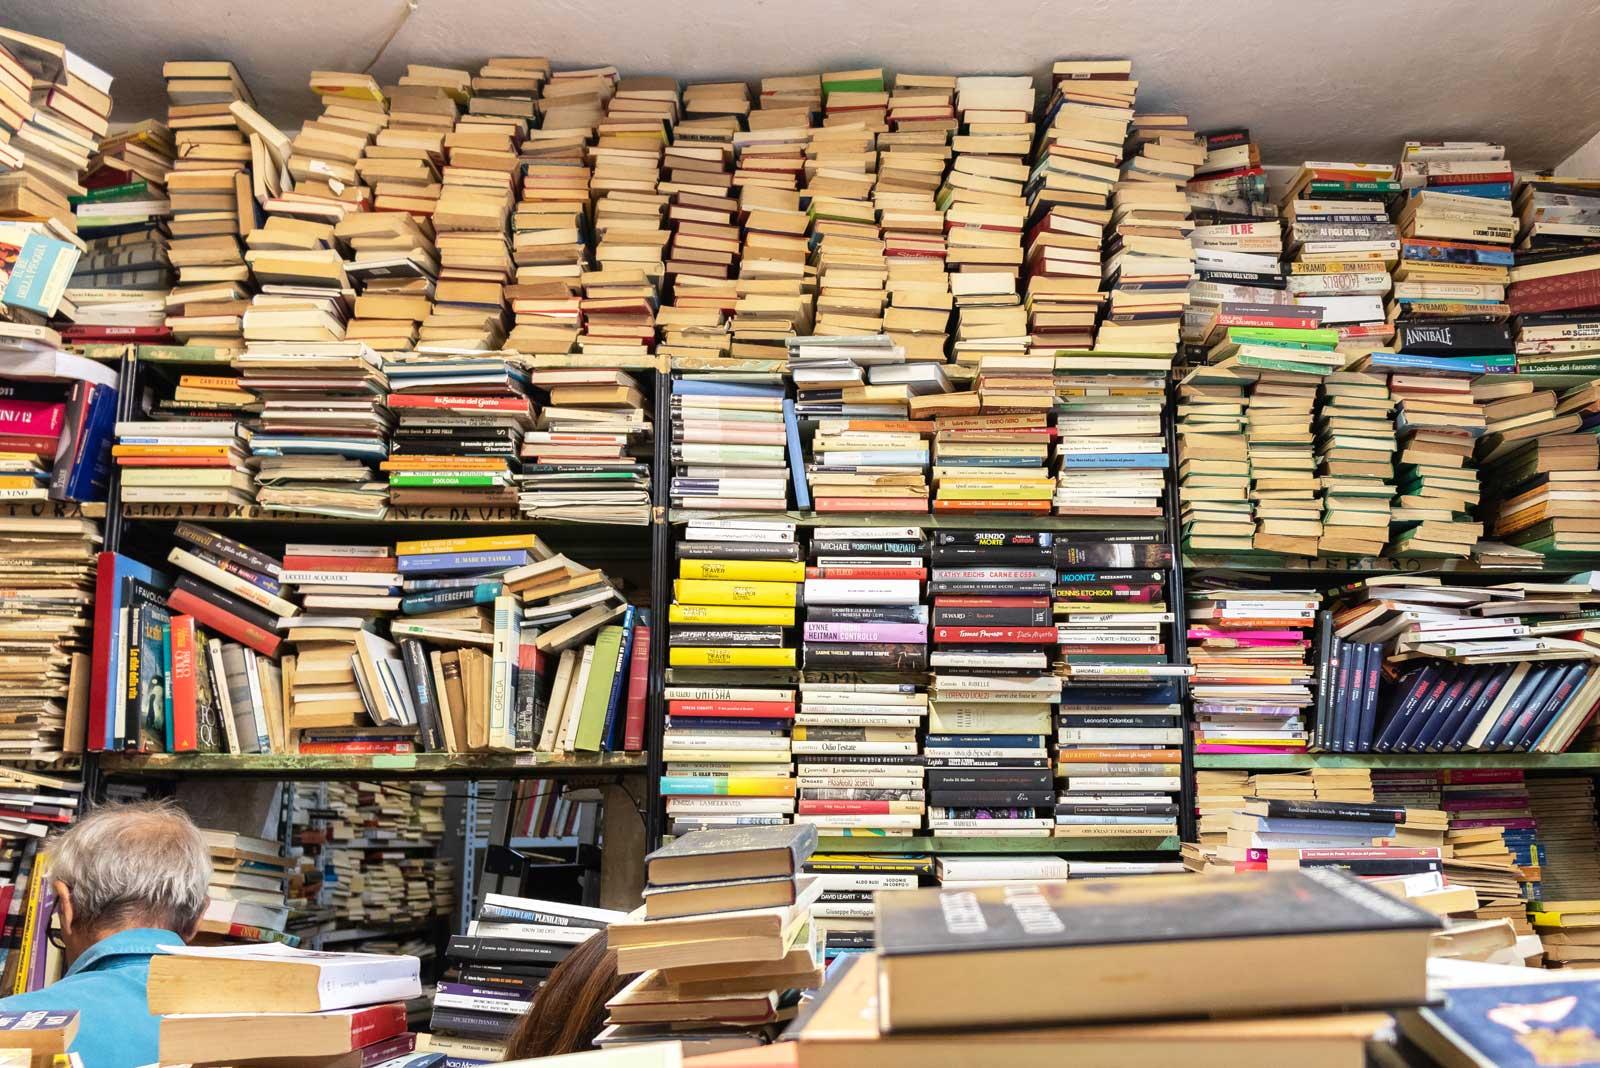 Da Angelo a Trionfale: libri usati per cuori vintage a Roma